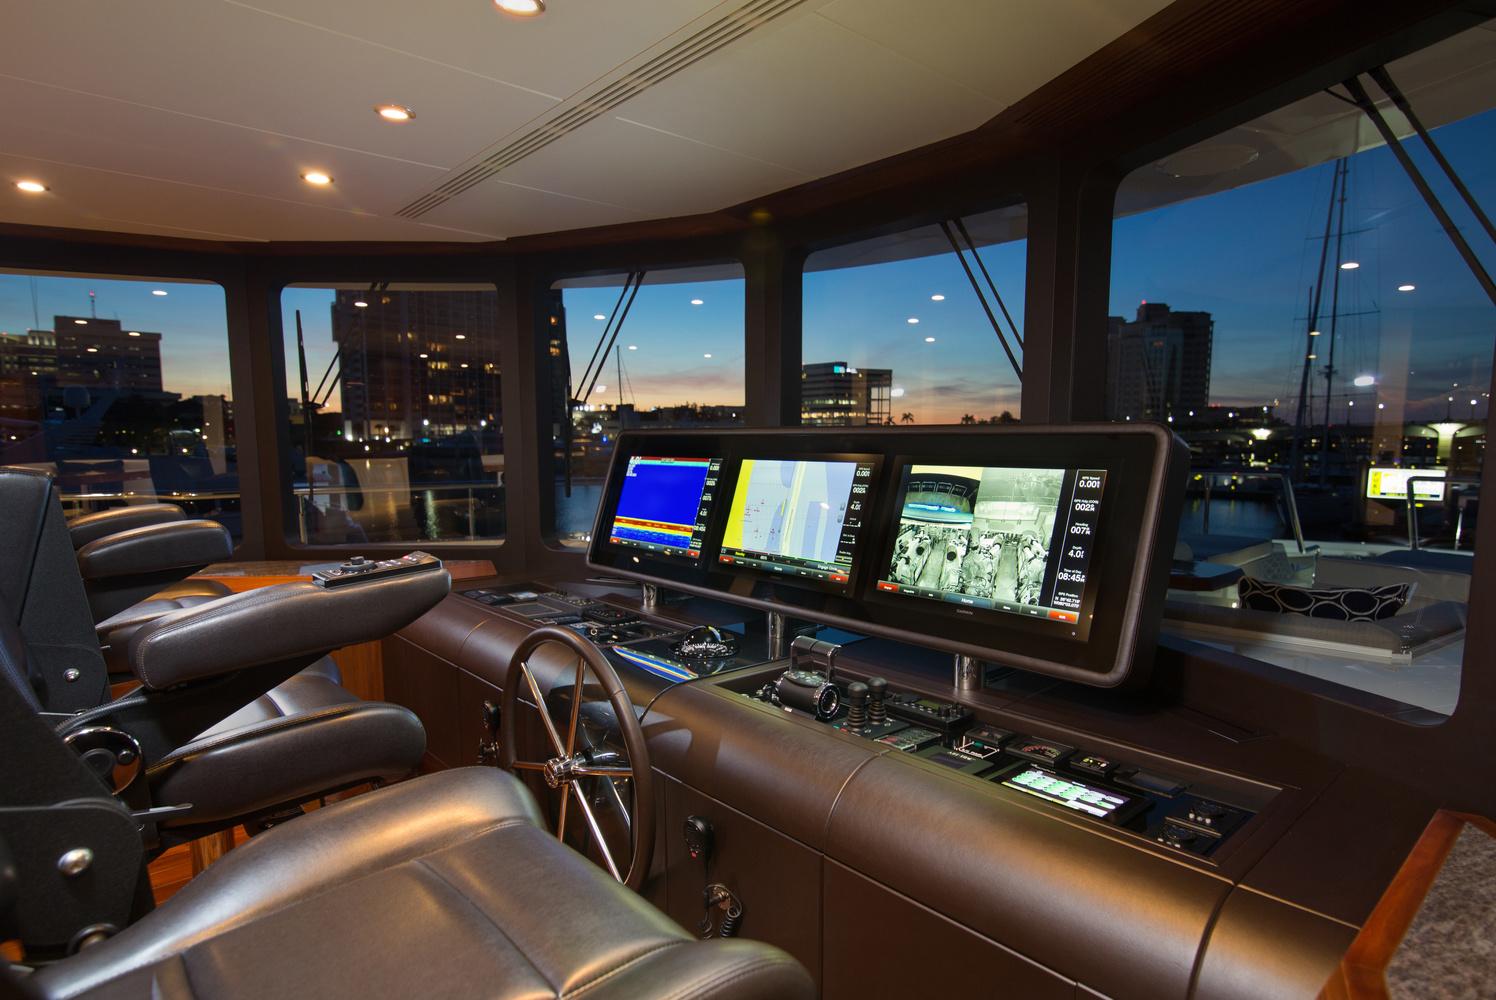 The cockpit by Brad Kearns